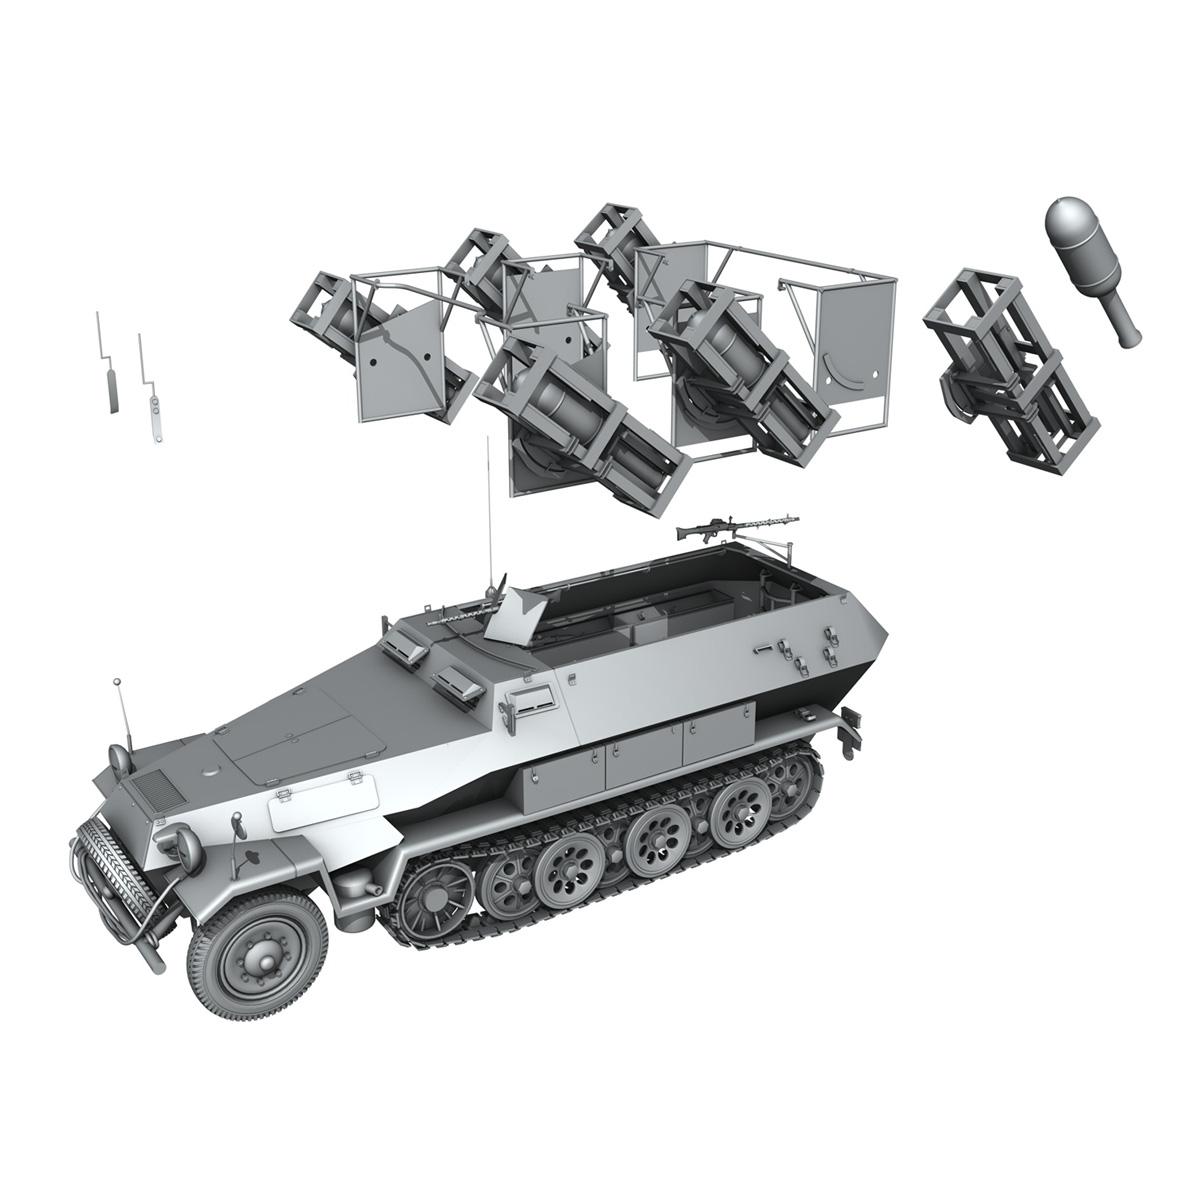 sdkfz 251 ausf.b – ground stuka 3d model 3ds fbx c4d lwo obj 251687